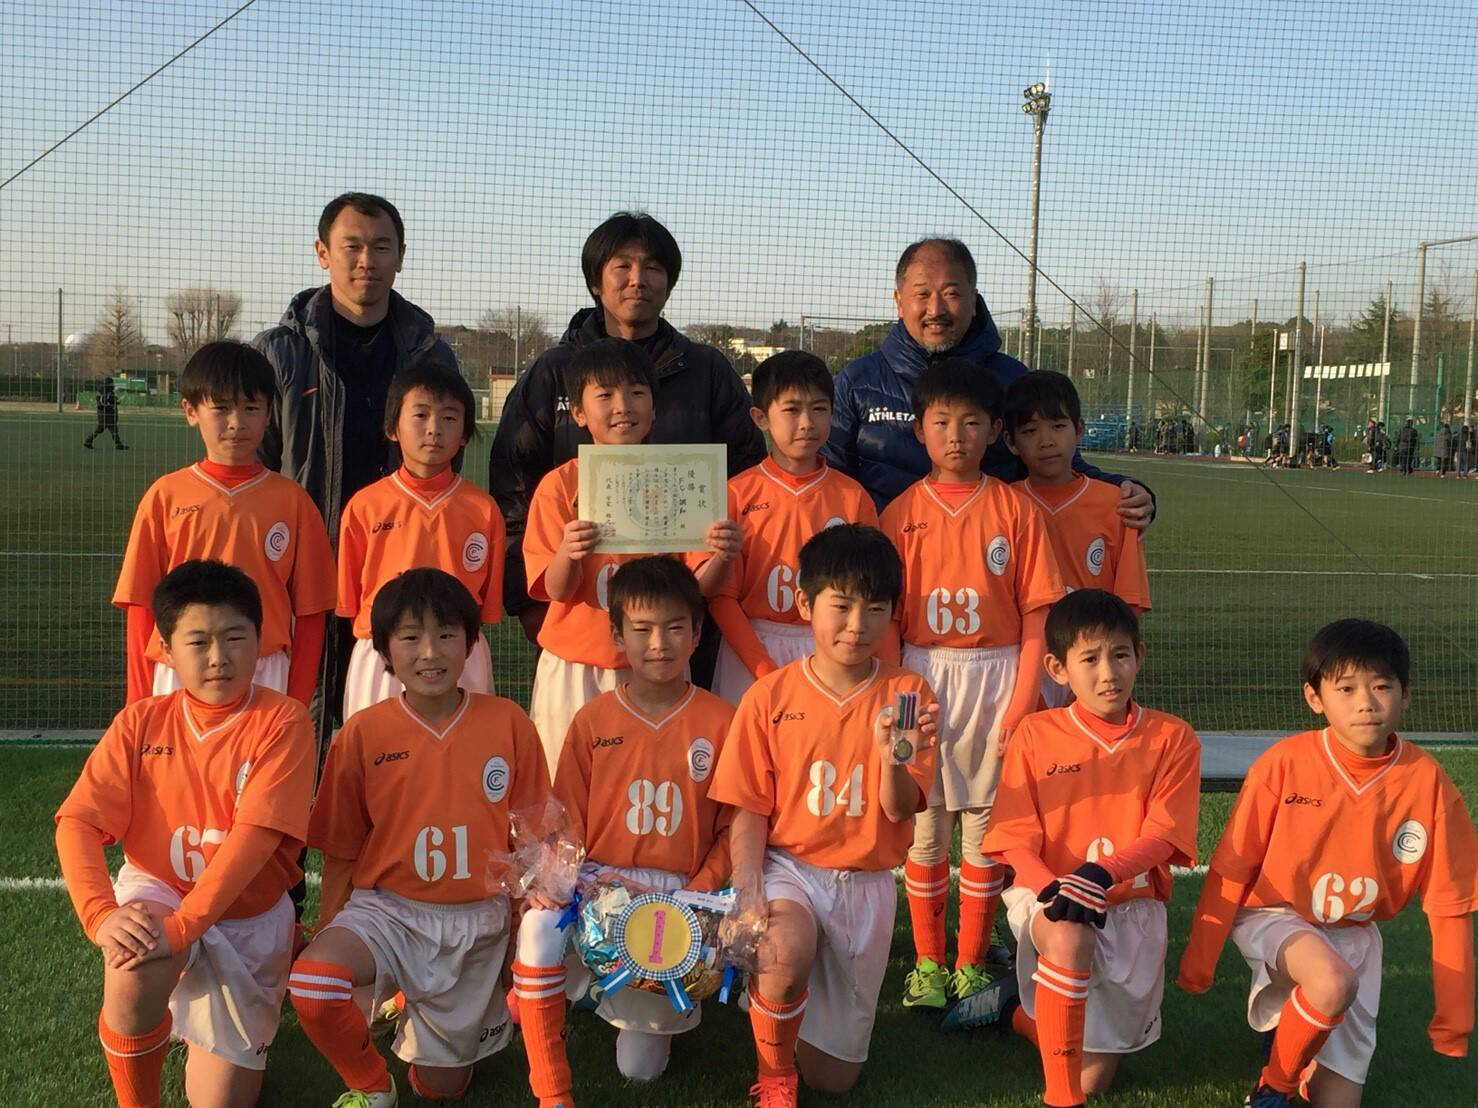 http://www.fc-chouwa.net/blog/images/campeon.jpg